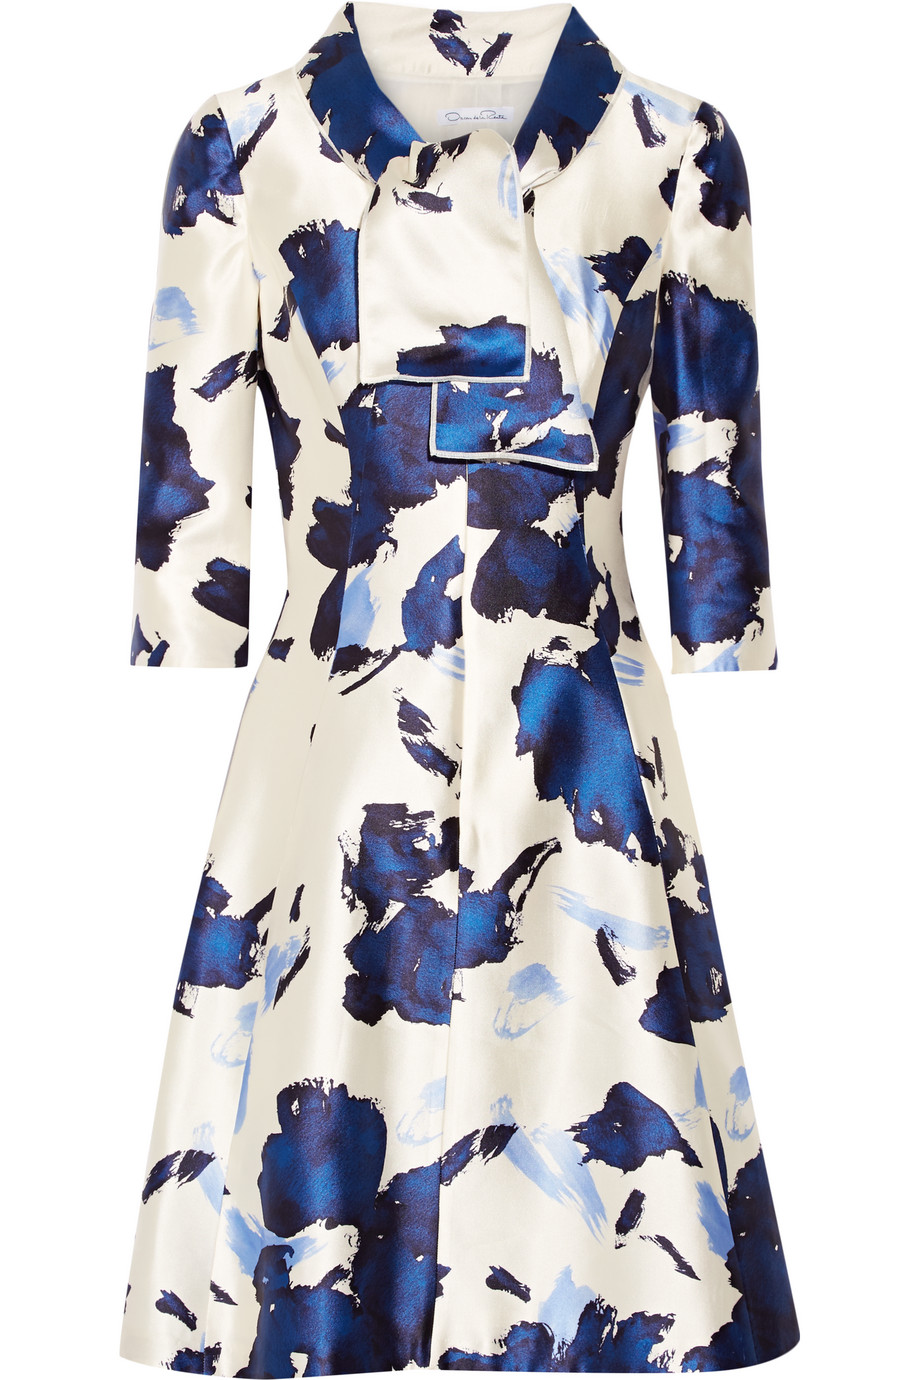 Oscar De La Renta Pussy-Bow Printed Silk-Faille Dress, Storm Blue, Women's - Printed, Size: 10